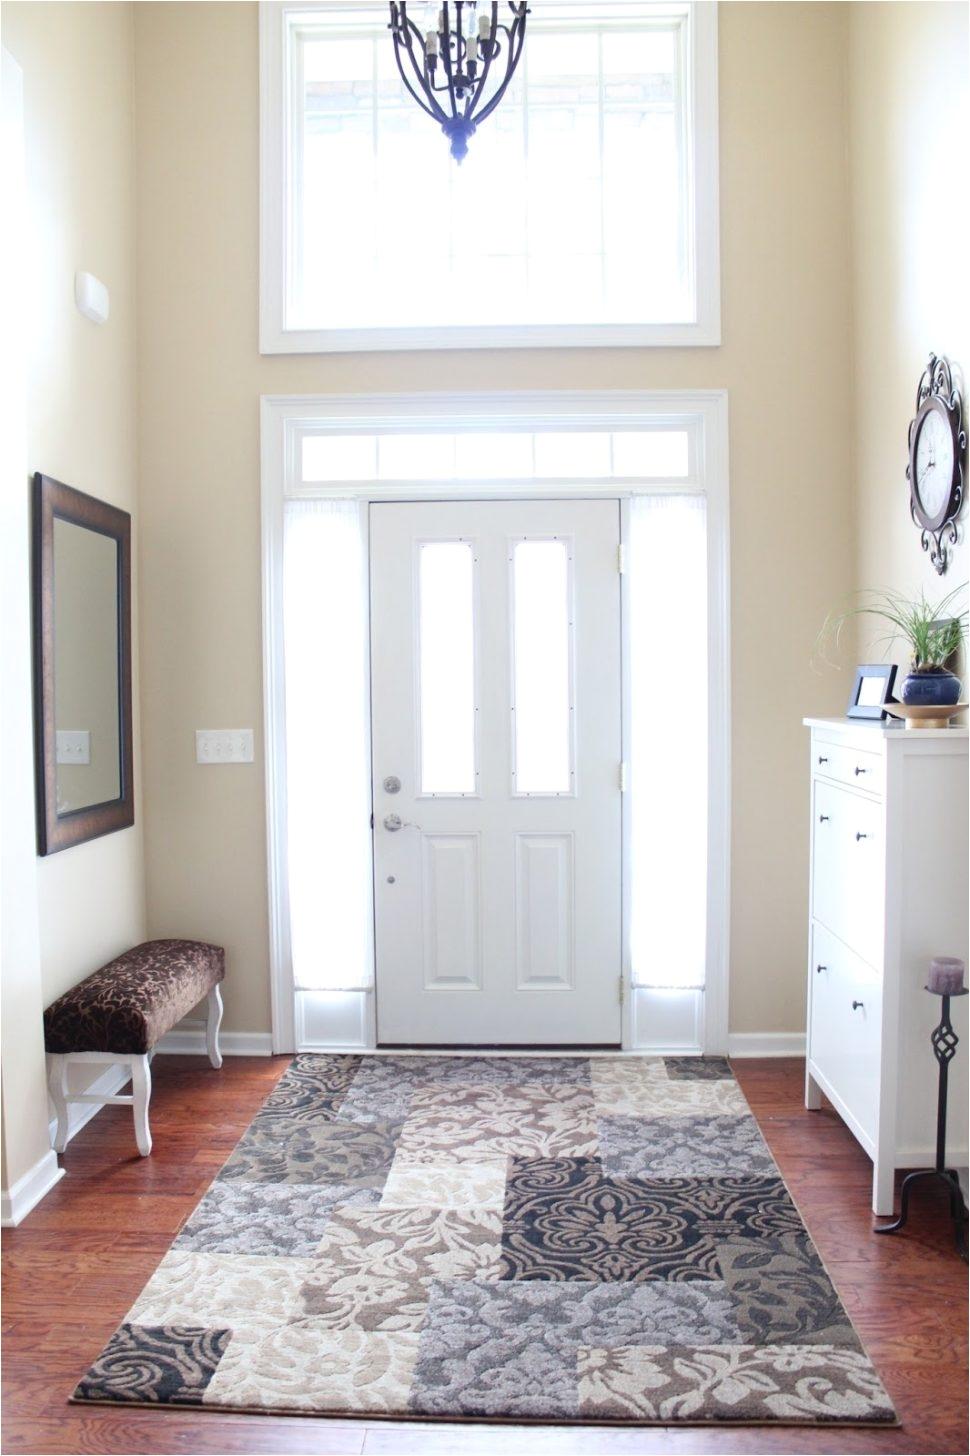 full size of indoor runner rugs large living room area for entryway hardwood floors floor design